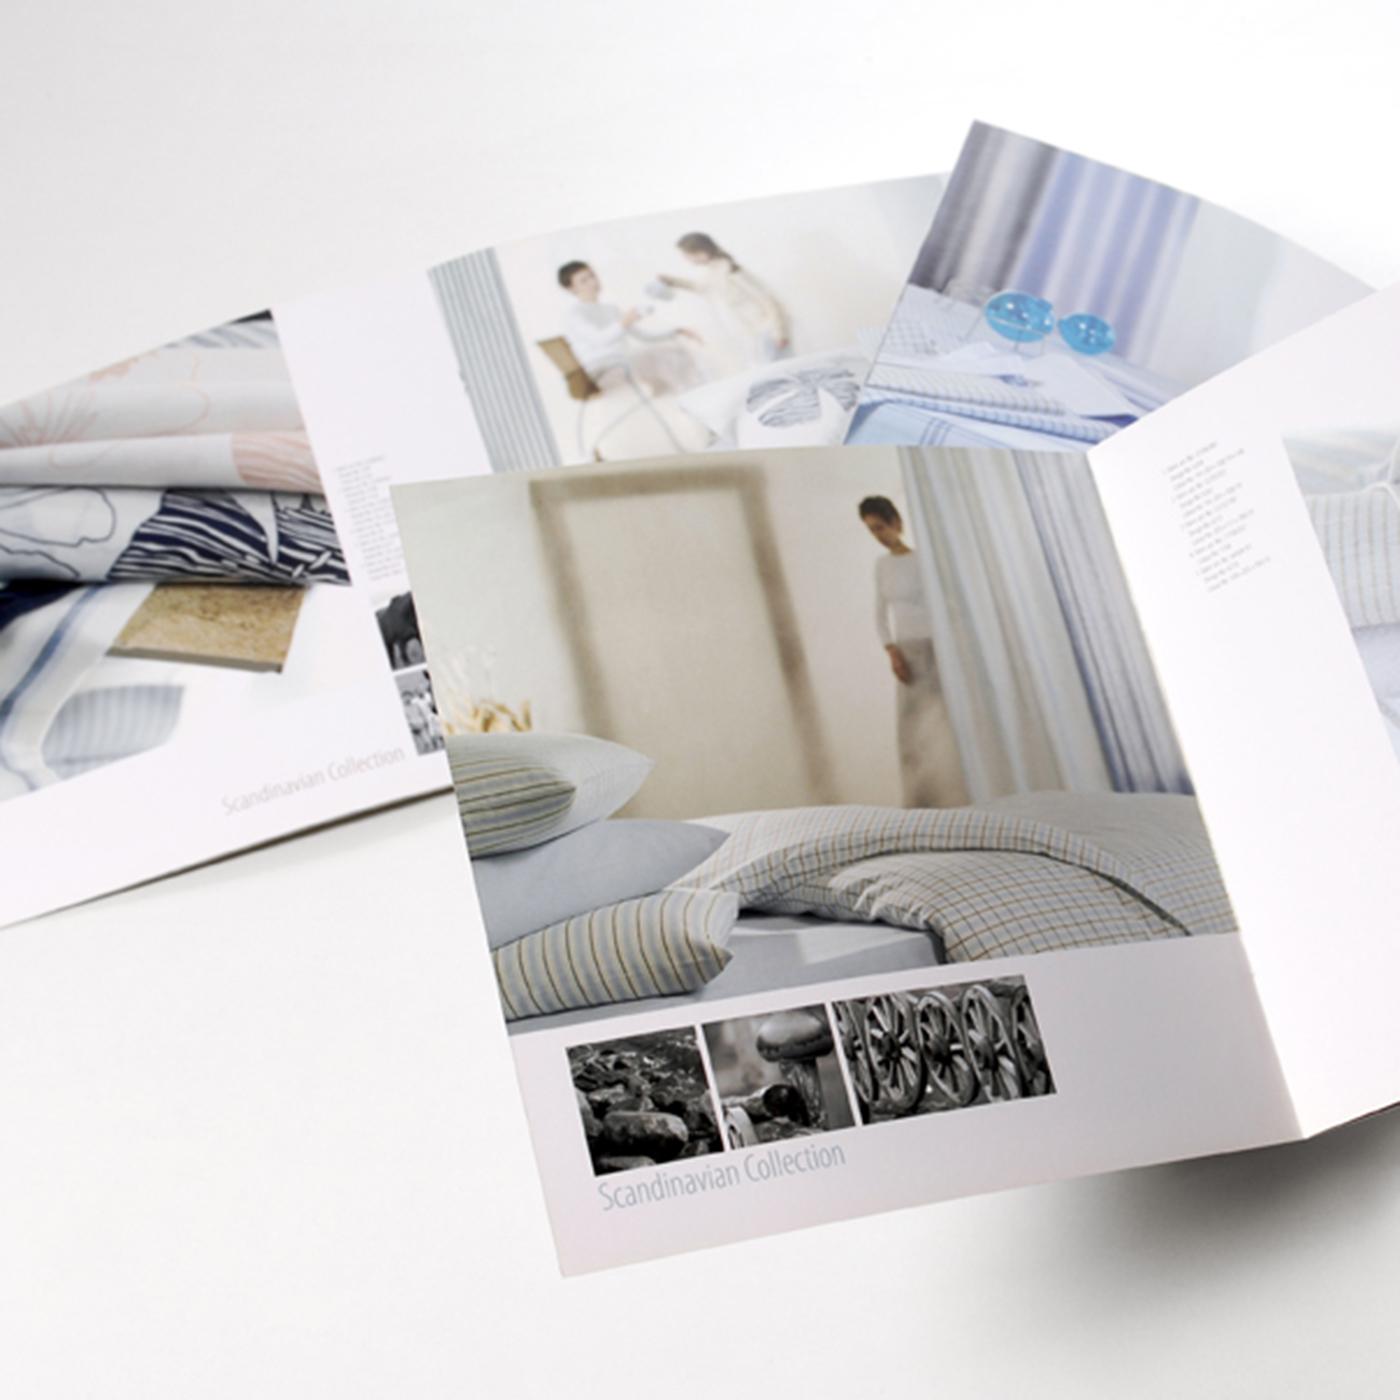 TopForma graphic design & photography | Madrid